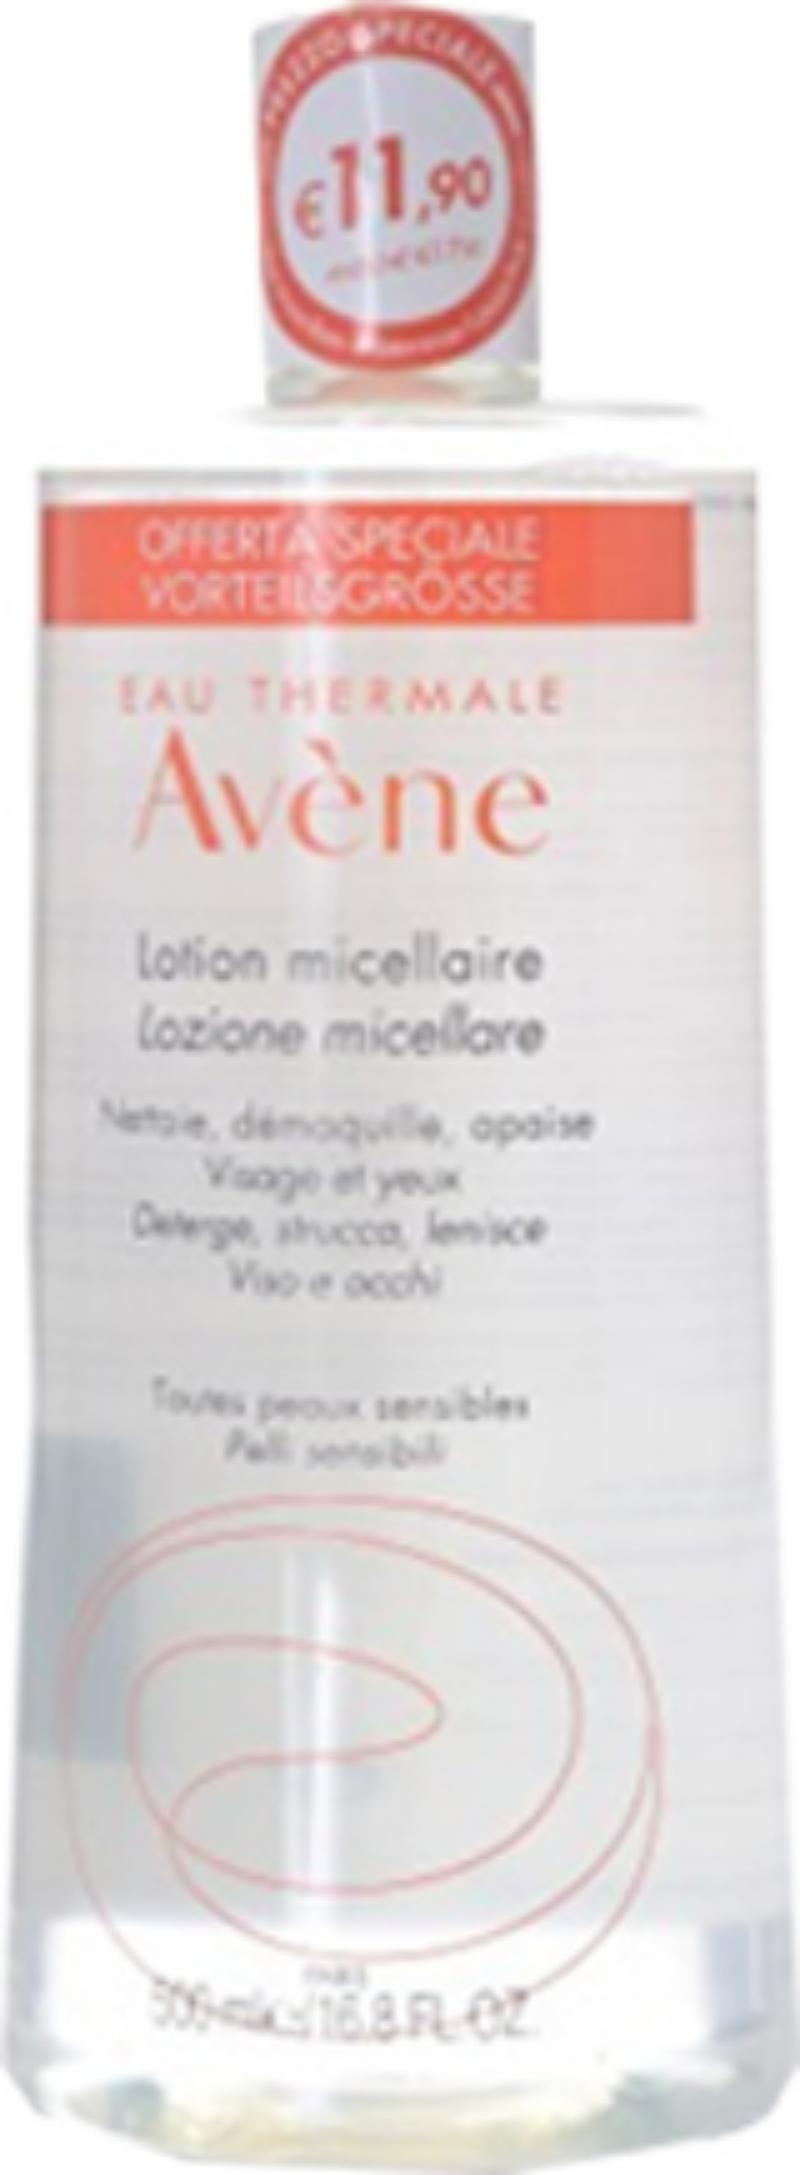 AVENE-LOZ-MICELLARE-500ML